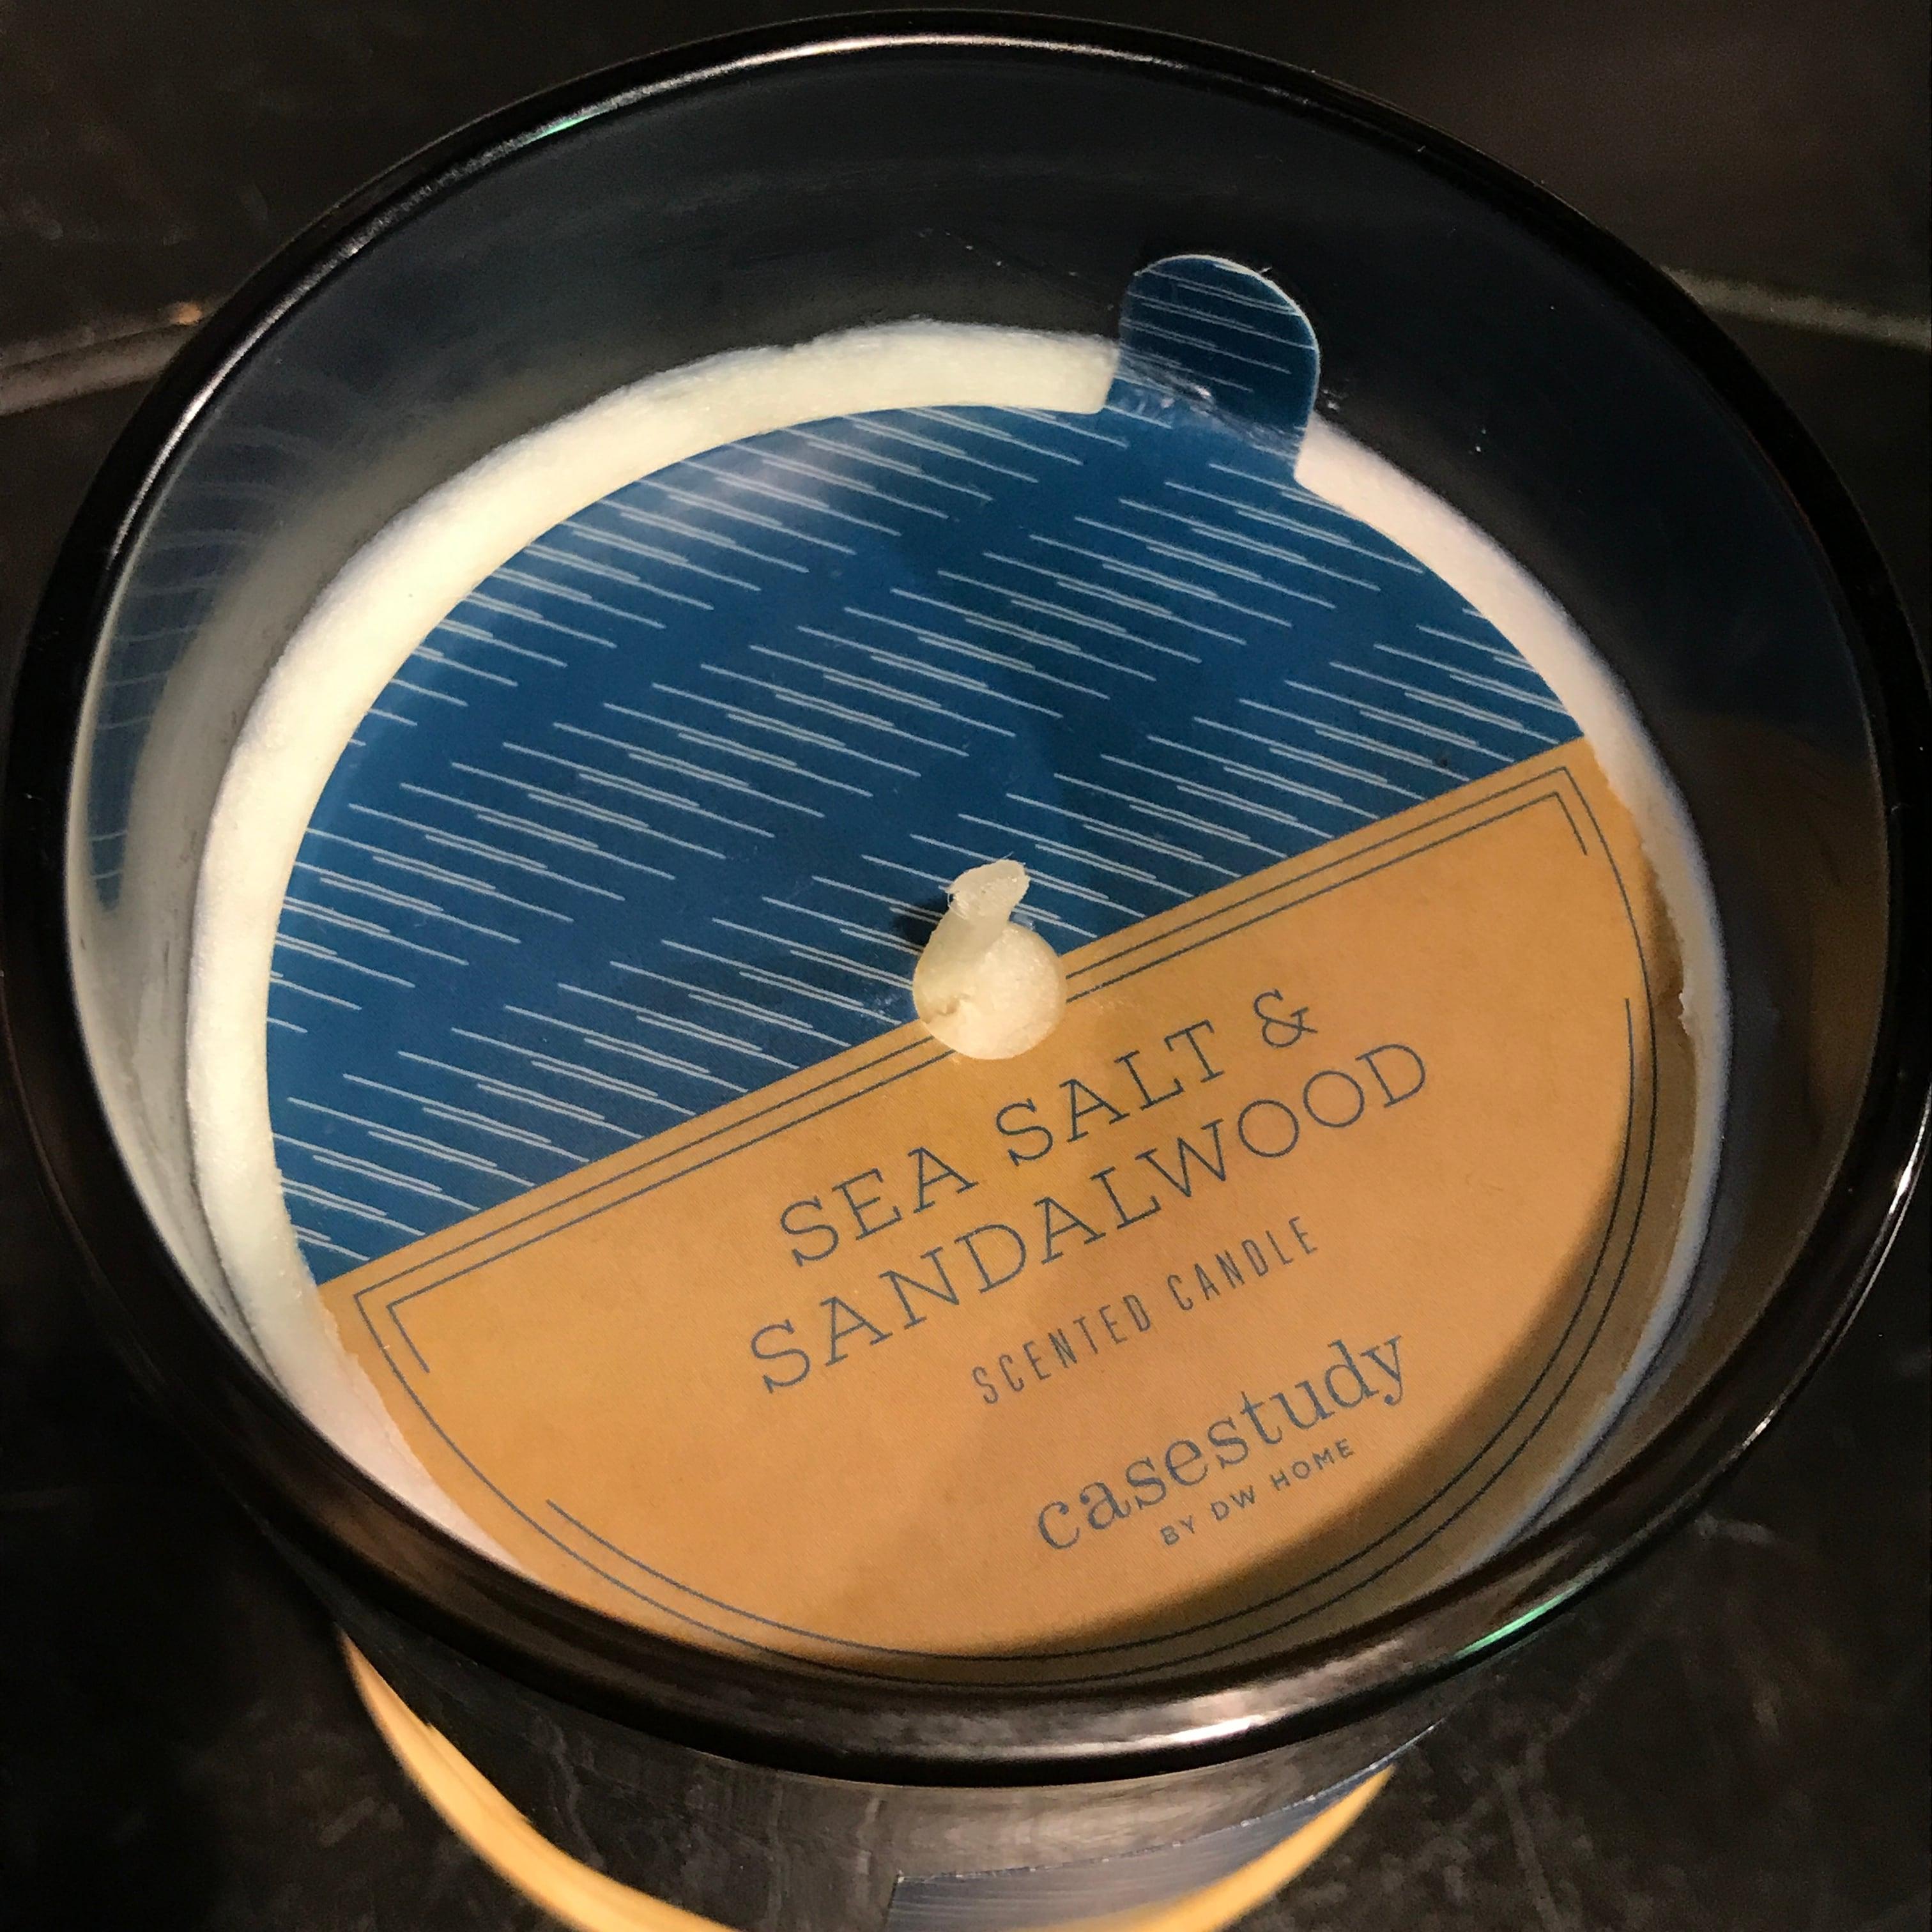 【DW Home Candles】SEA SALT & SANDALWOOD【アロマキャンドル】